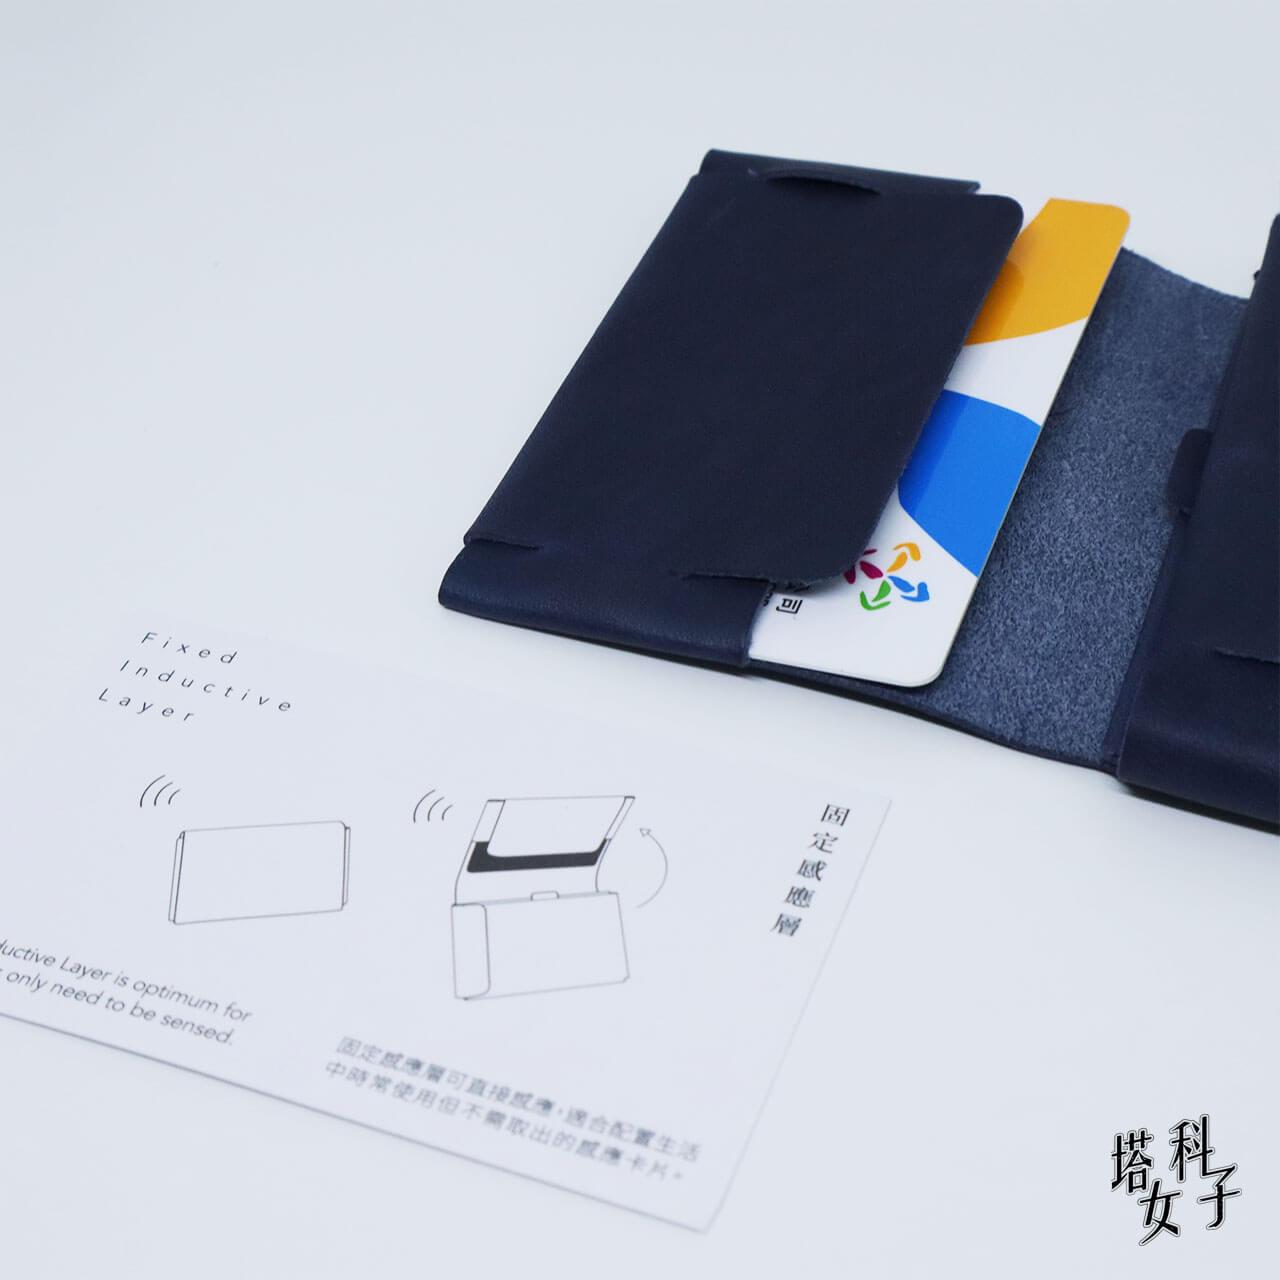 0.7 Wallet 雙面感應卡夾 固定感應層